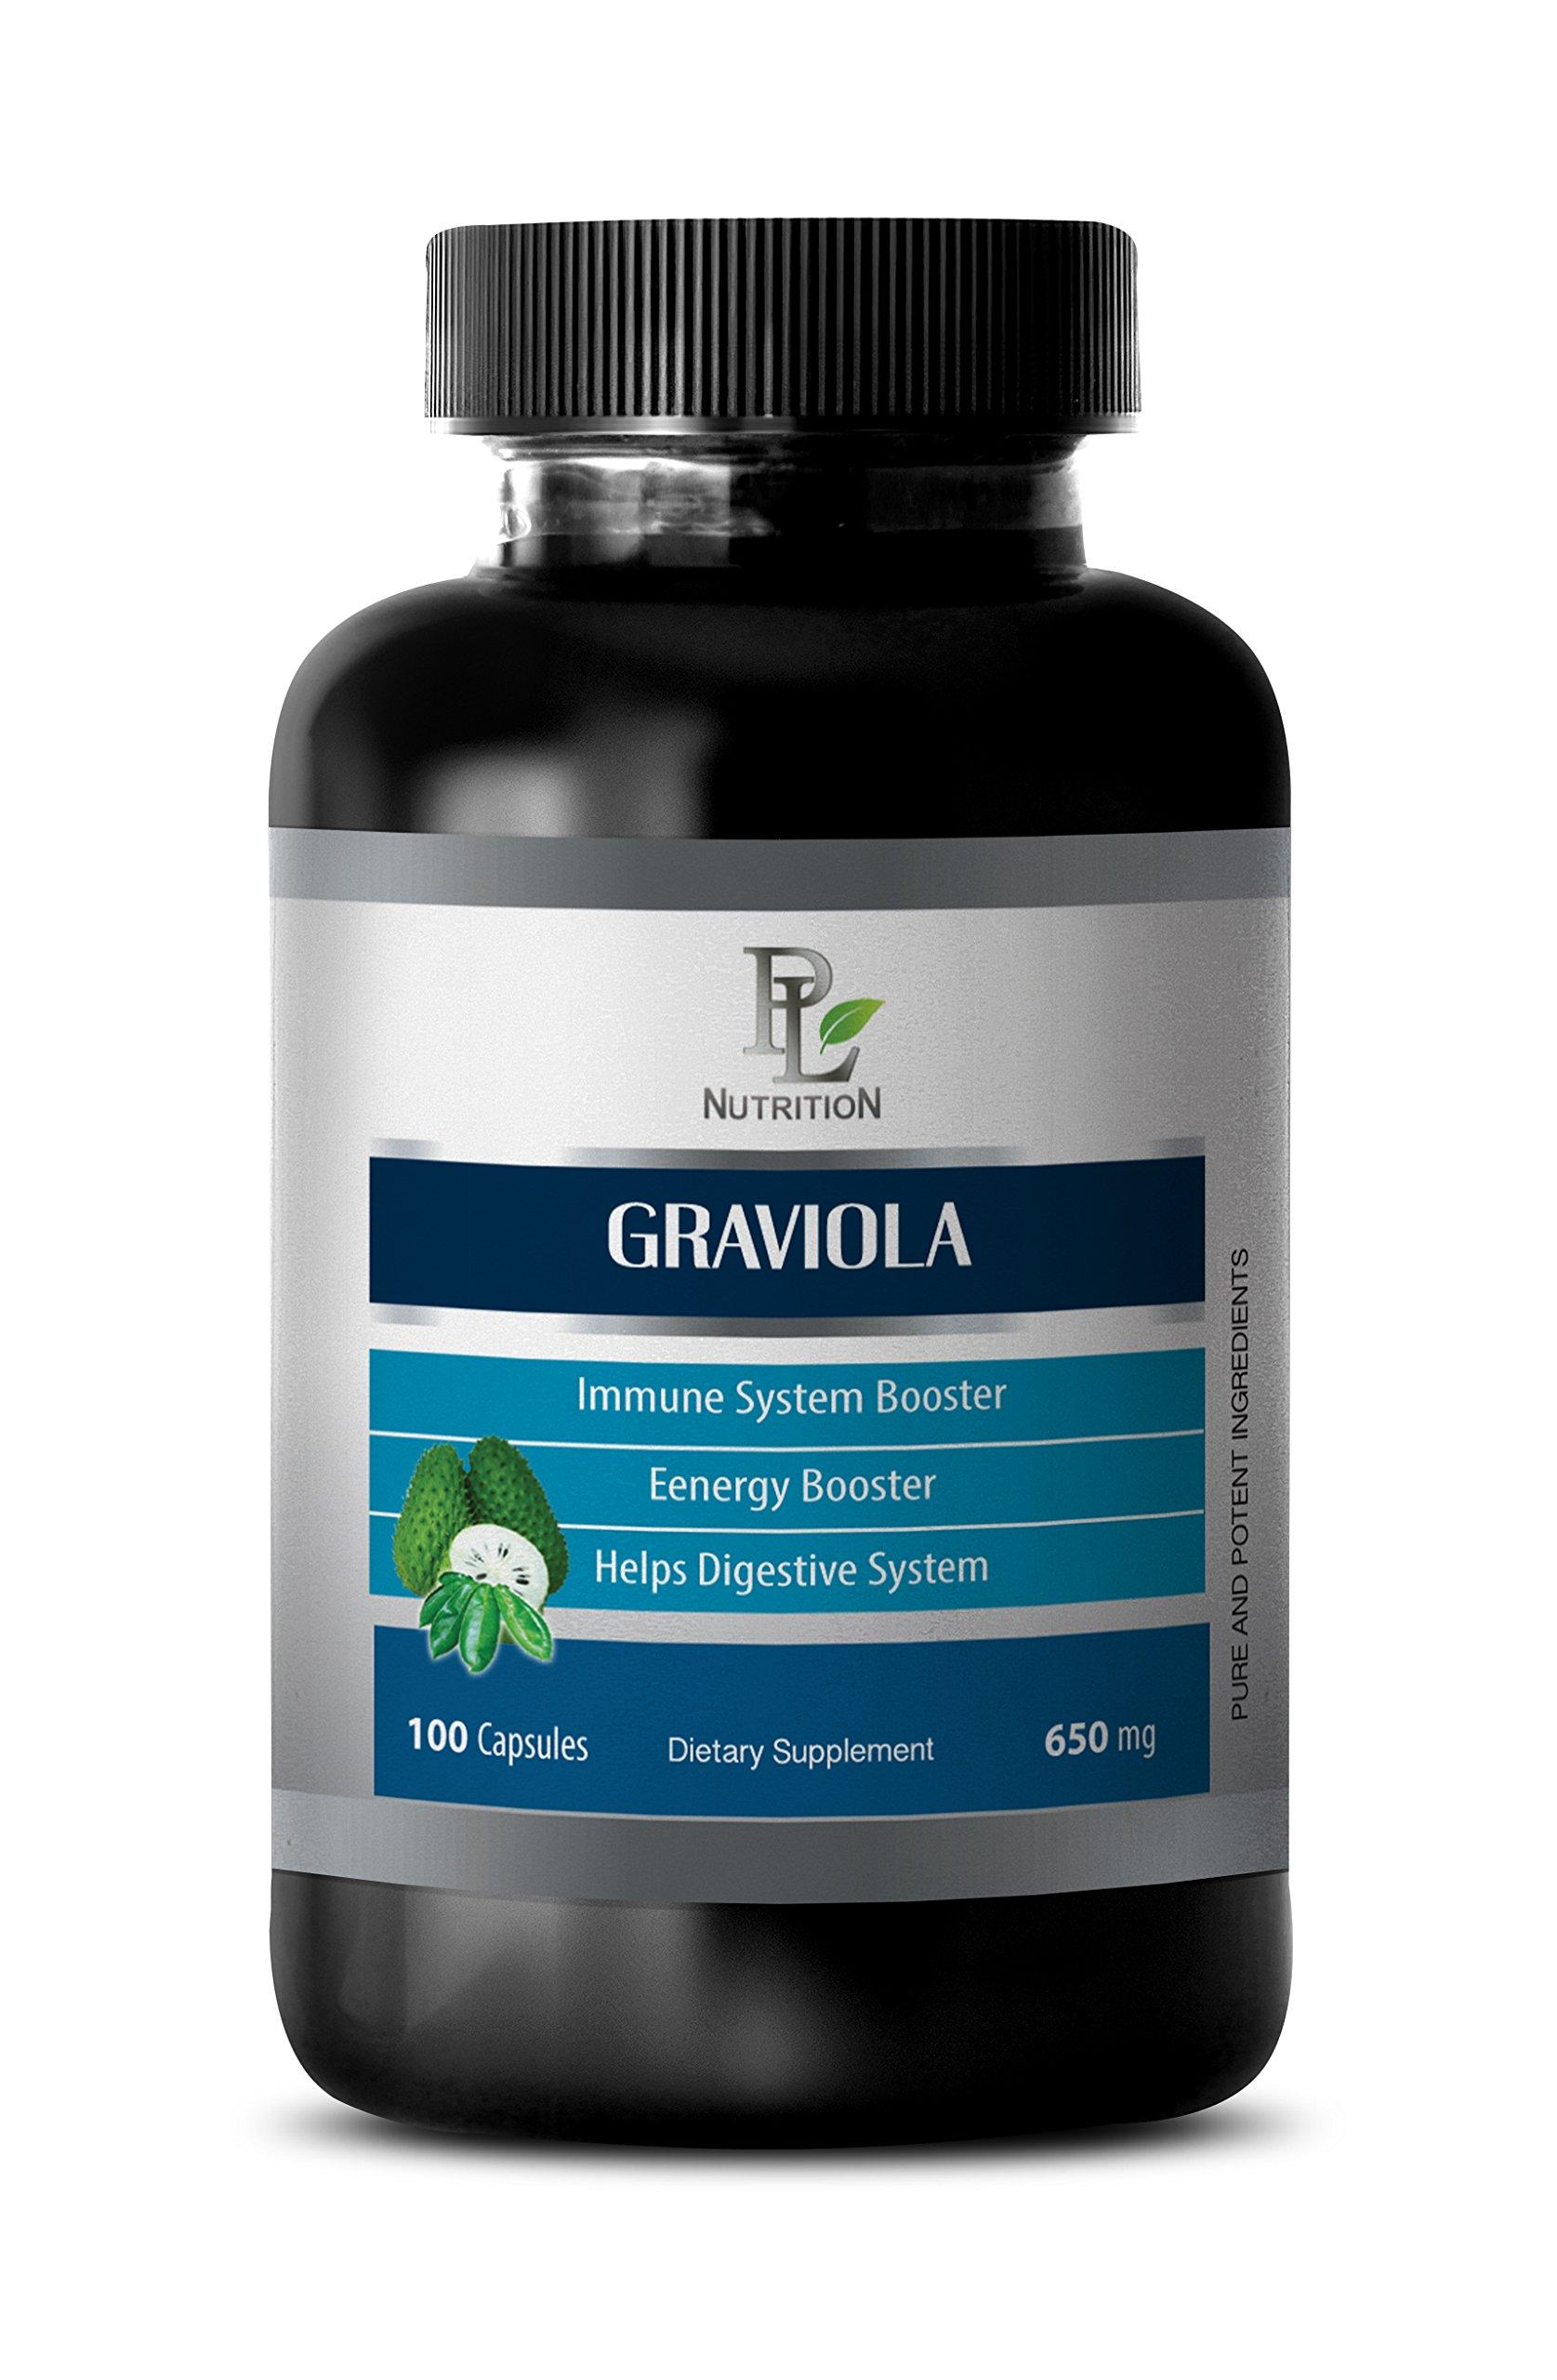 Graviola pure - GRAVIOLA EXTRACT 650 Mg - Antioxidant - 1 Bottle 100 Capsules